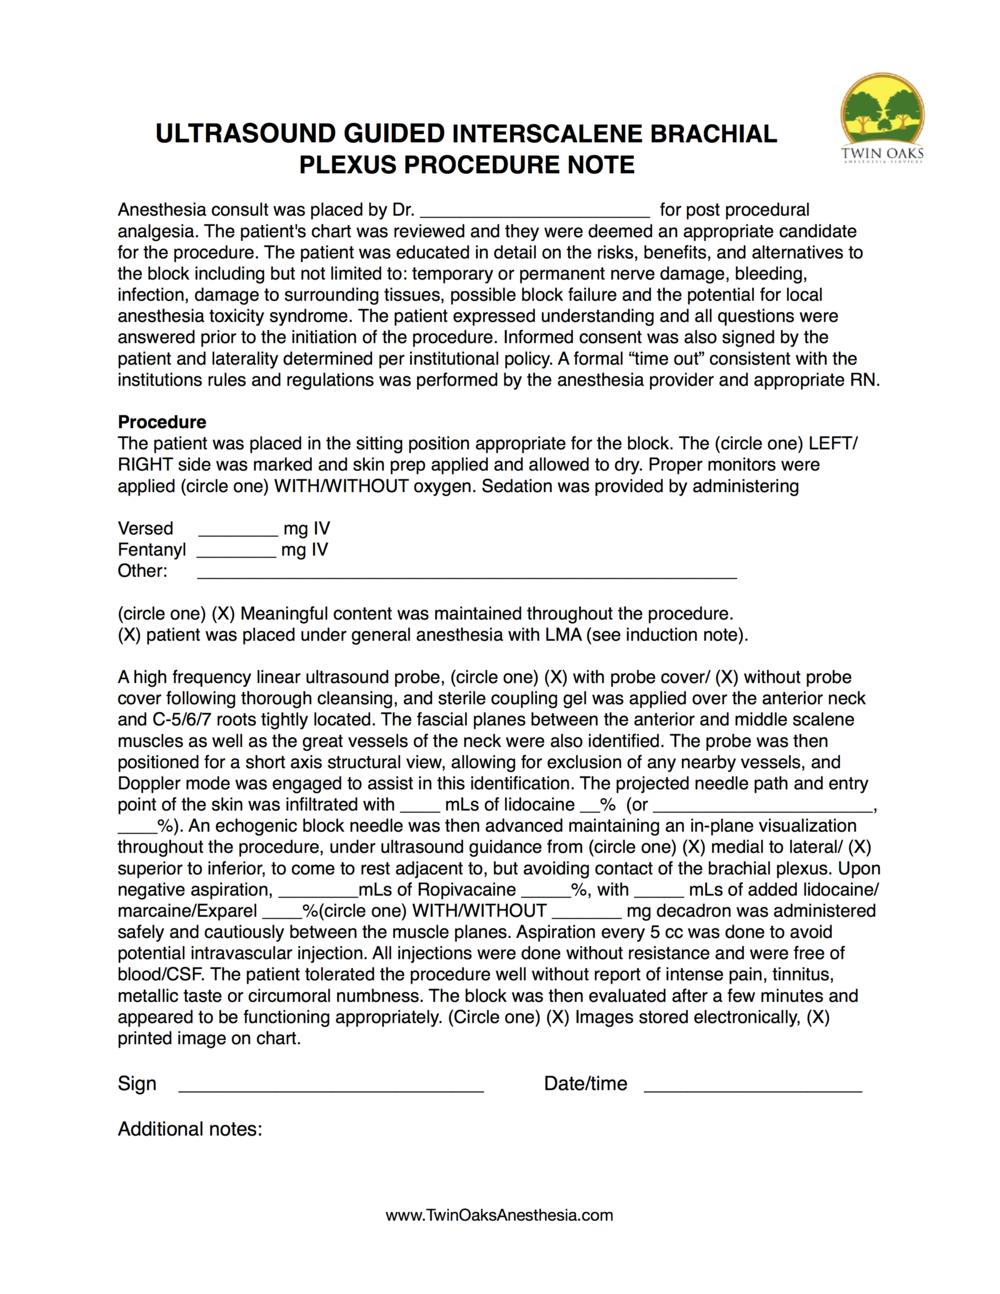 intersclene Procedure Form.png